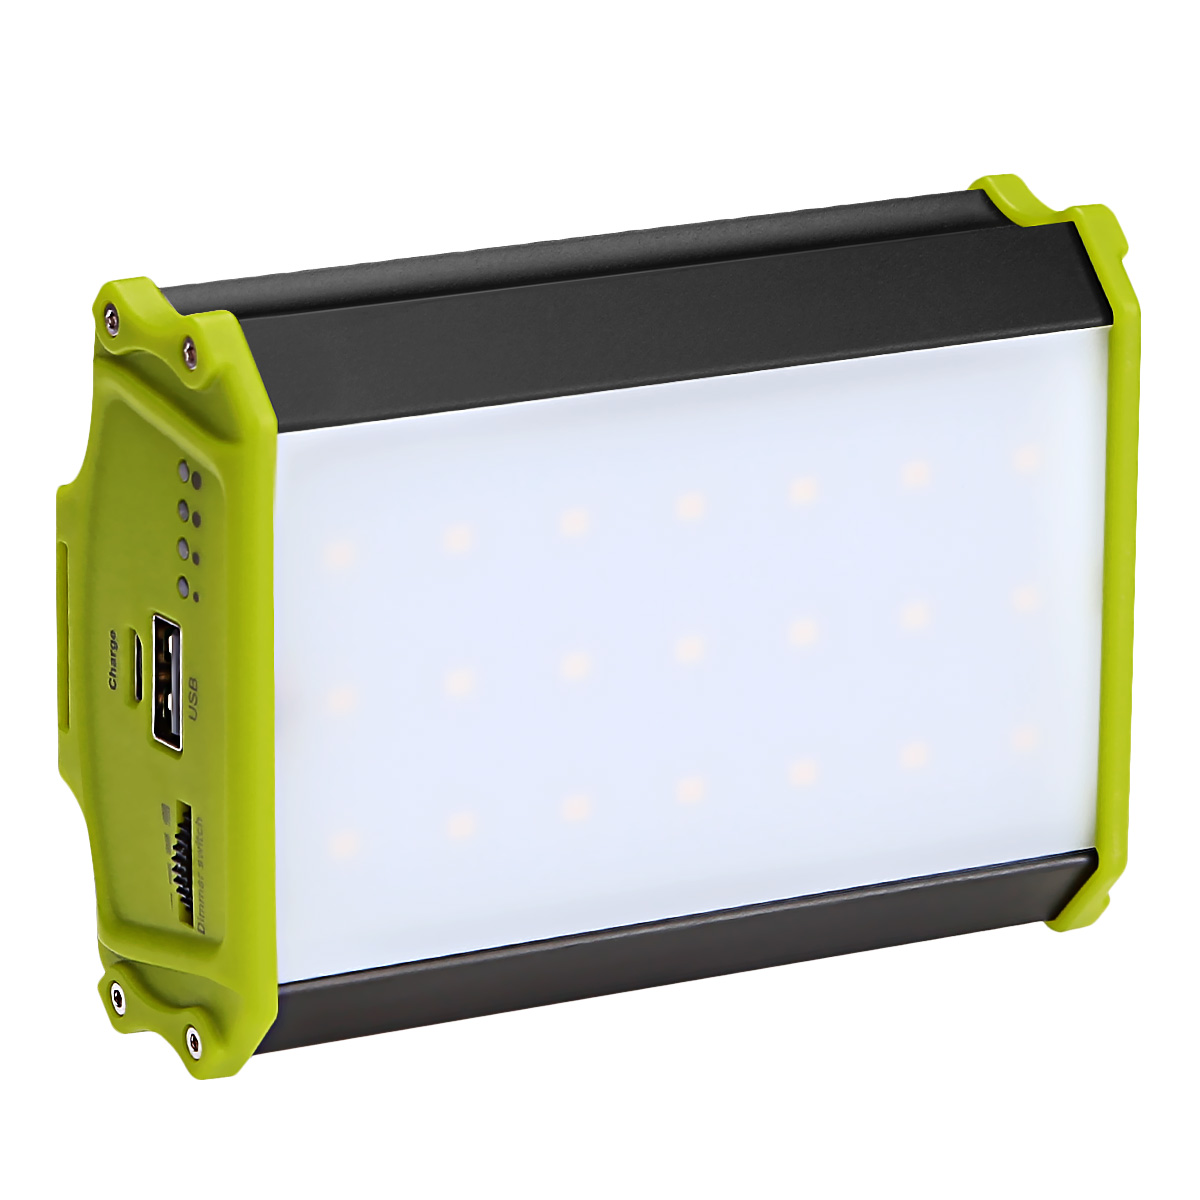 330lm LED Campinglampe, Dimmbar, USB Wiederaufladbar, Magnetisch, 4400mAh Energiebank